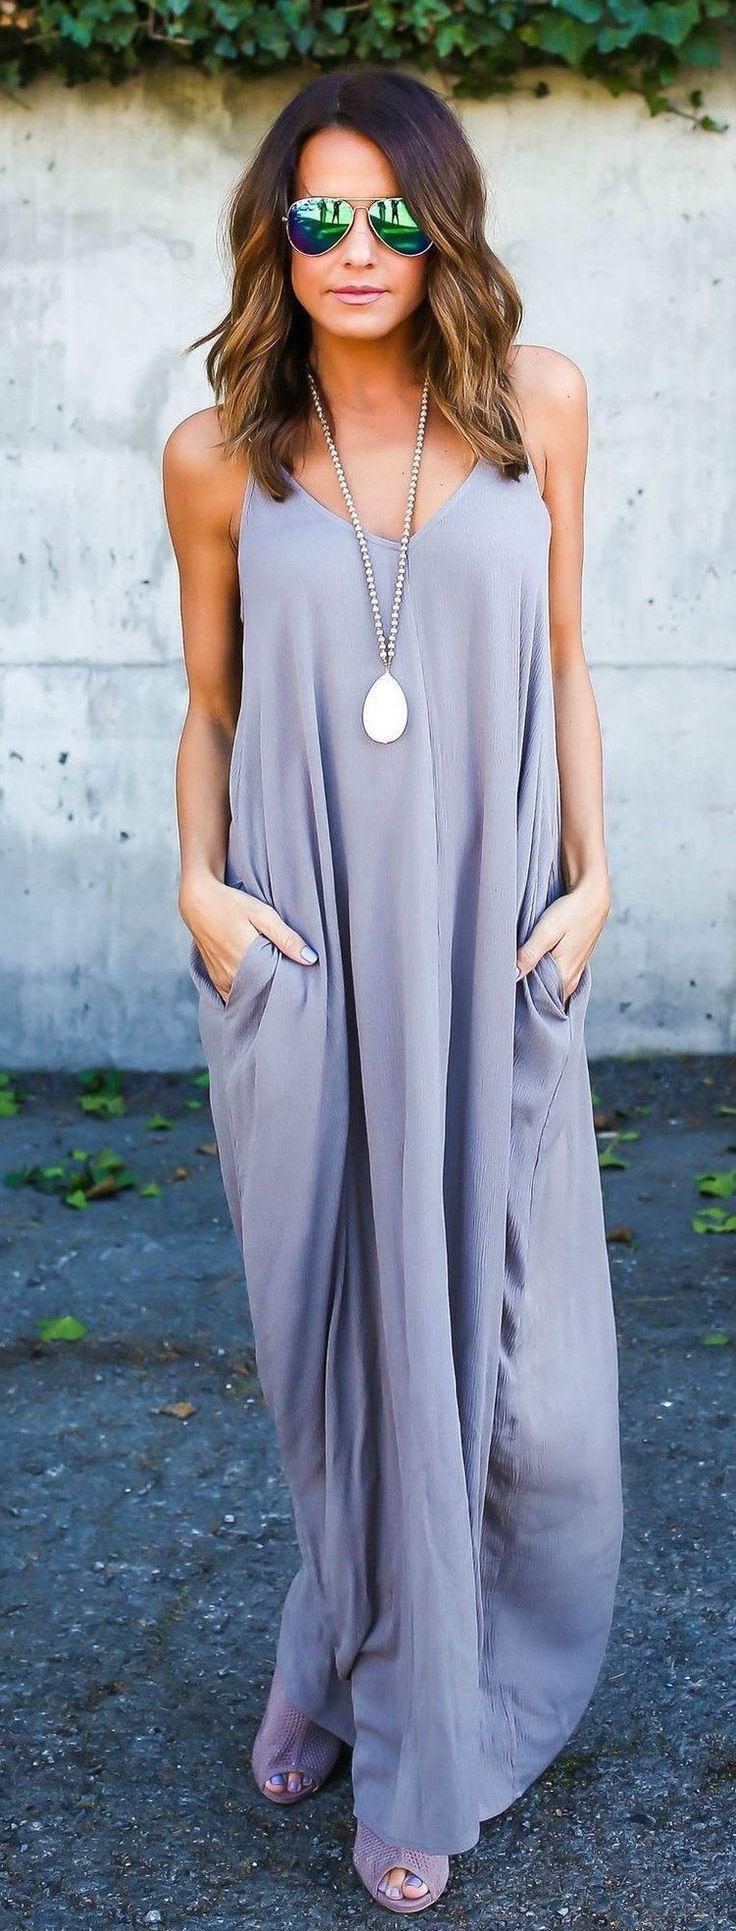 Lavender maxi dress.